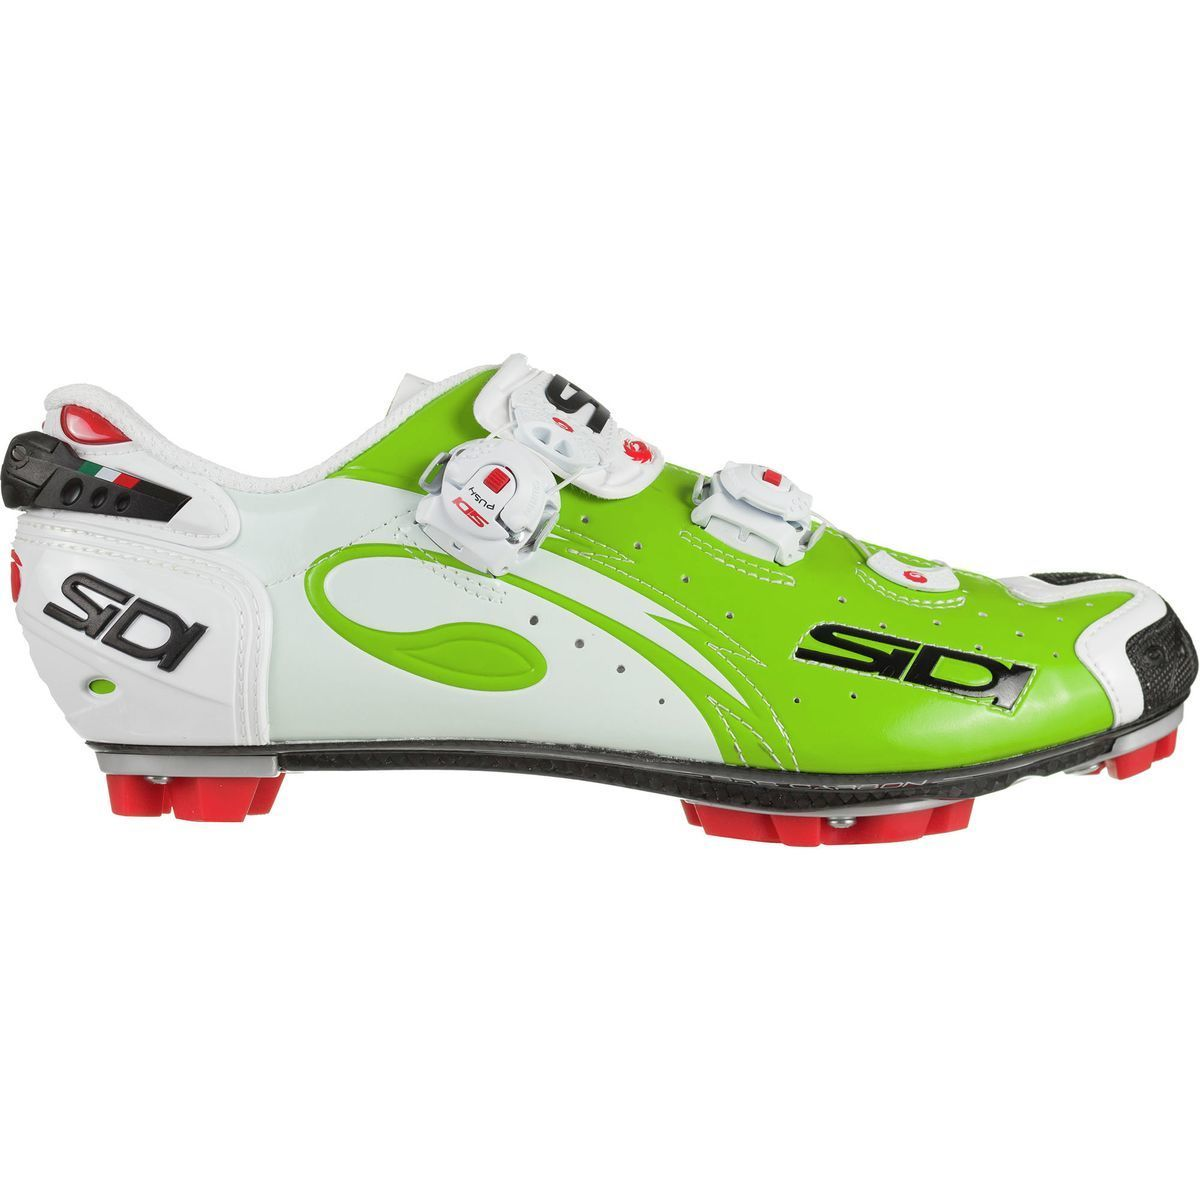 Sidi Drako Push Limited Edition Shoe - Men's SID009C